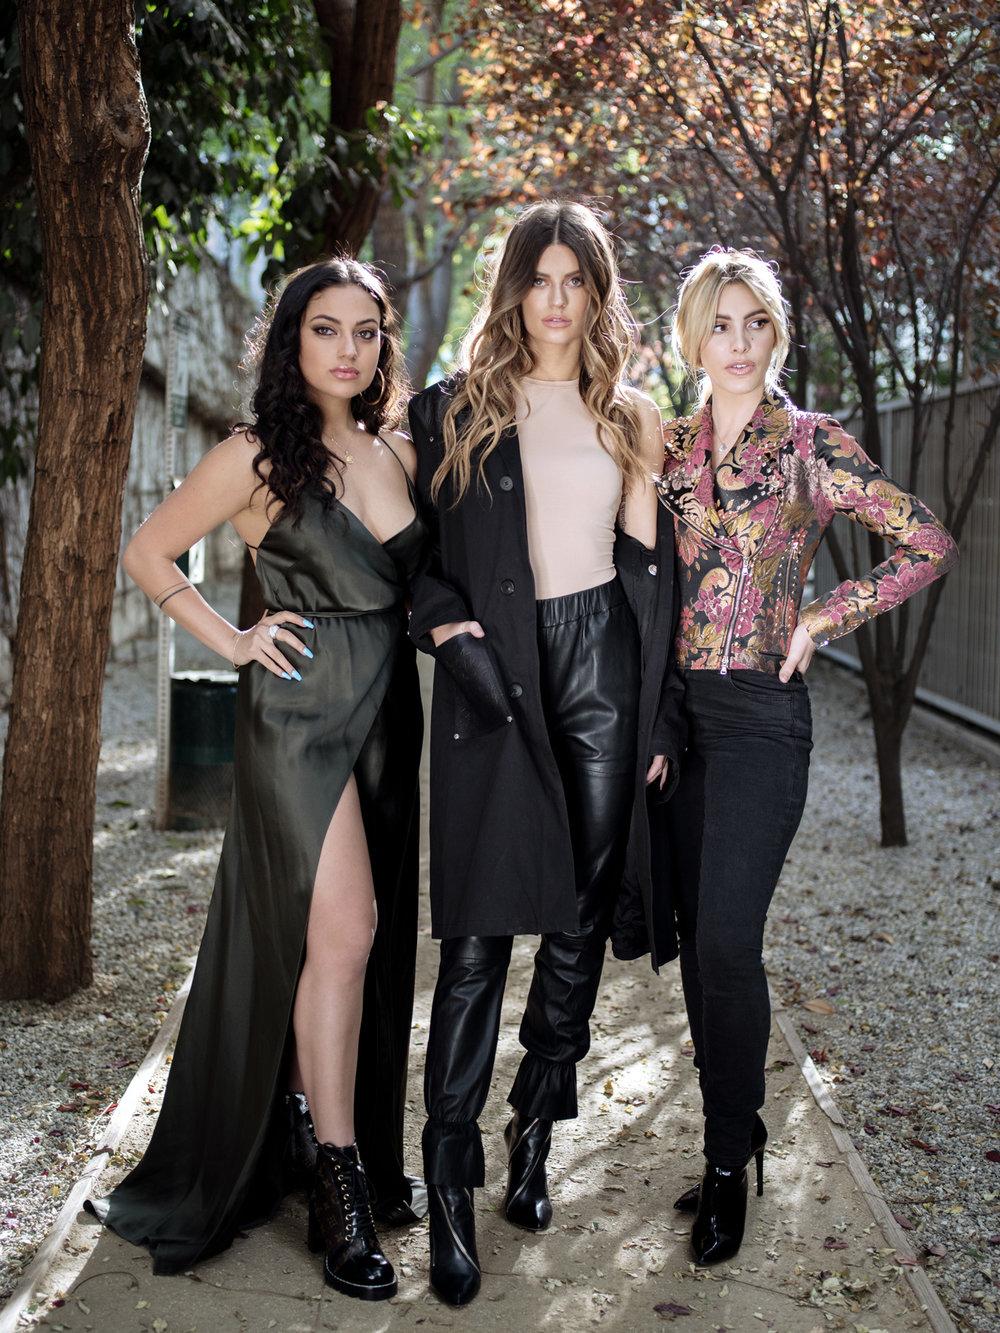 Inanna Sarkis, Lele Pons, Hannah Stocking  Internet Personalities for WWD Magazine